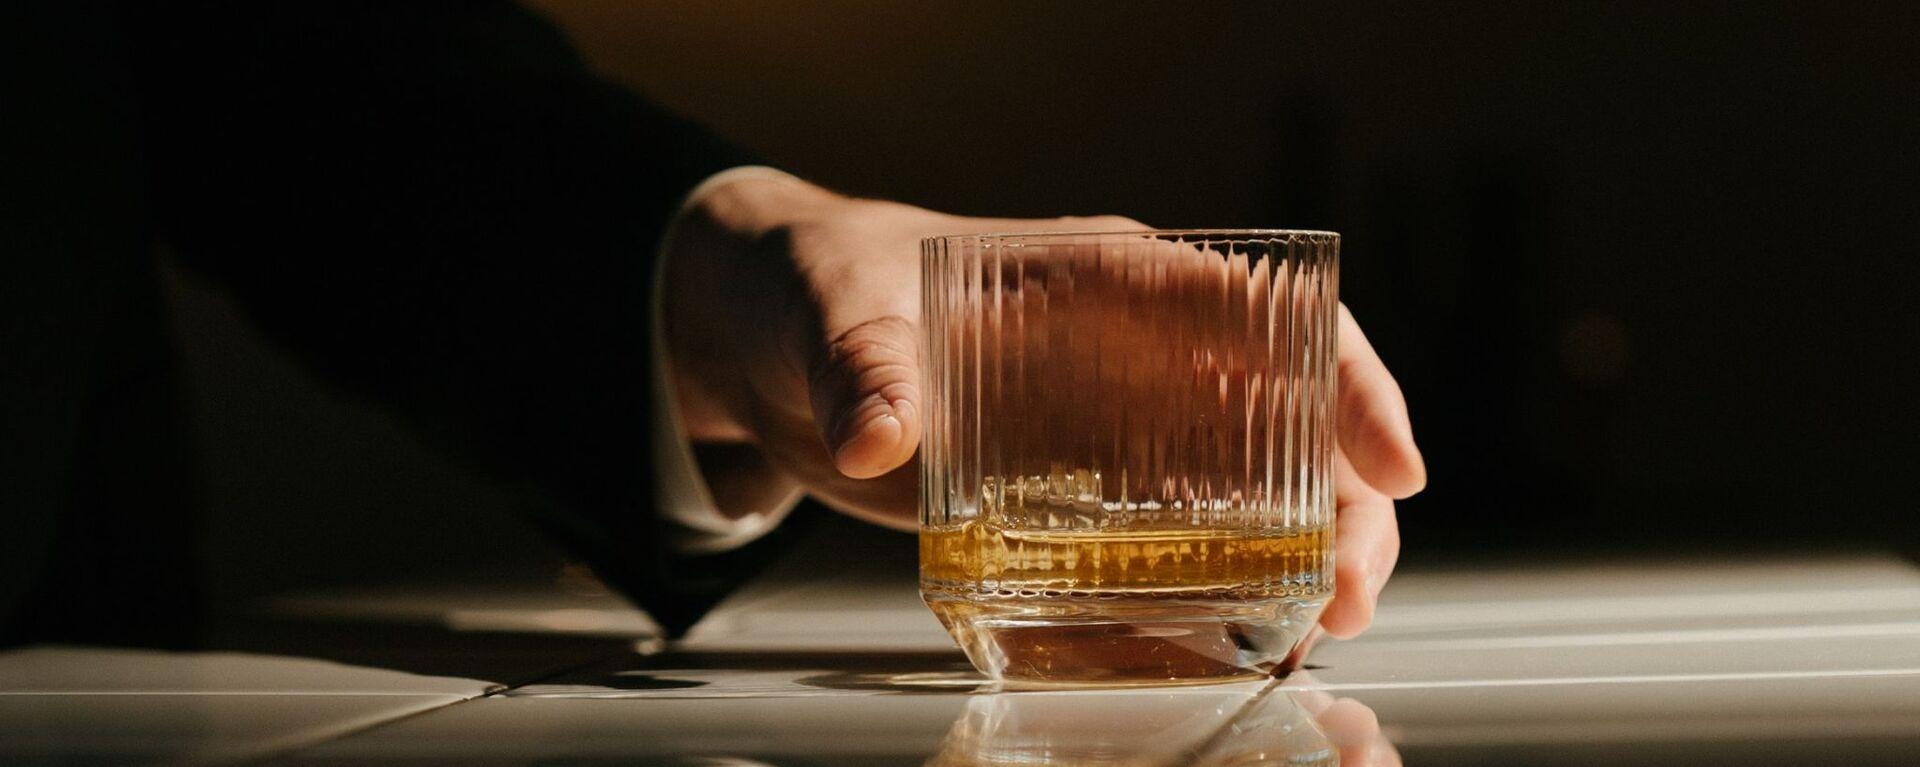 Un vaso de alcohol (imagen referencial) - Sputnik Mundo, 1920, 26.03.2021